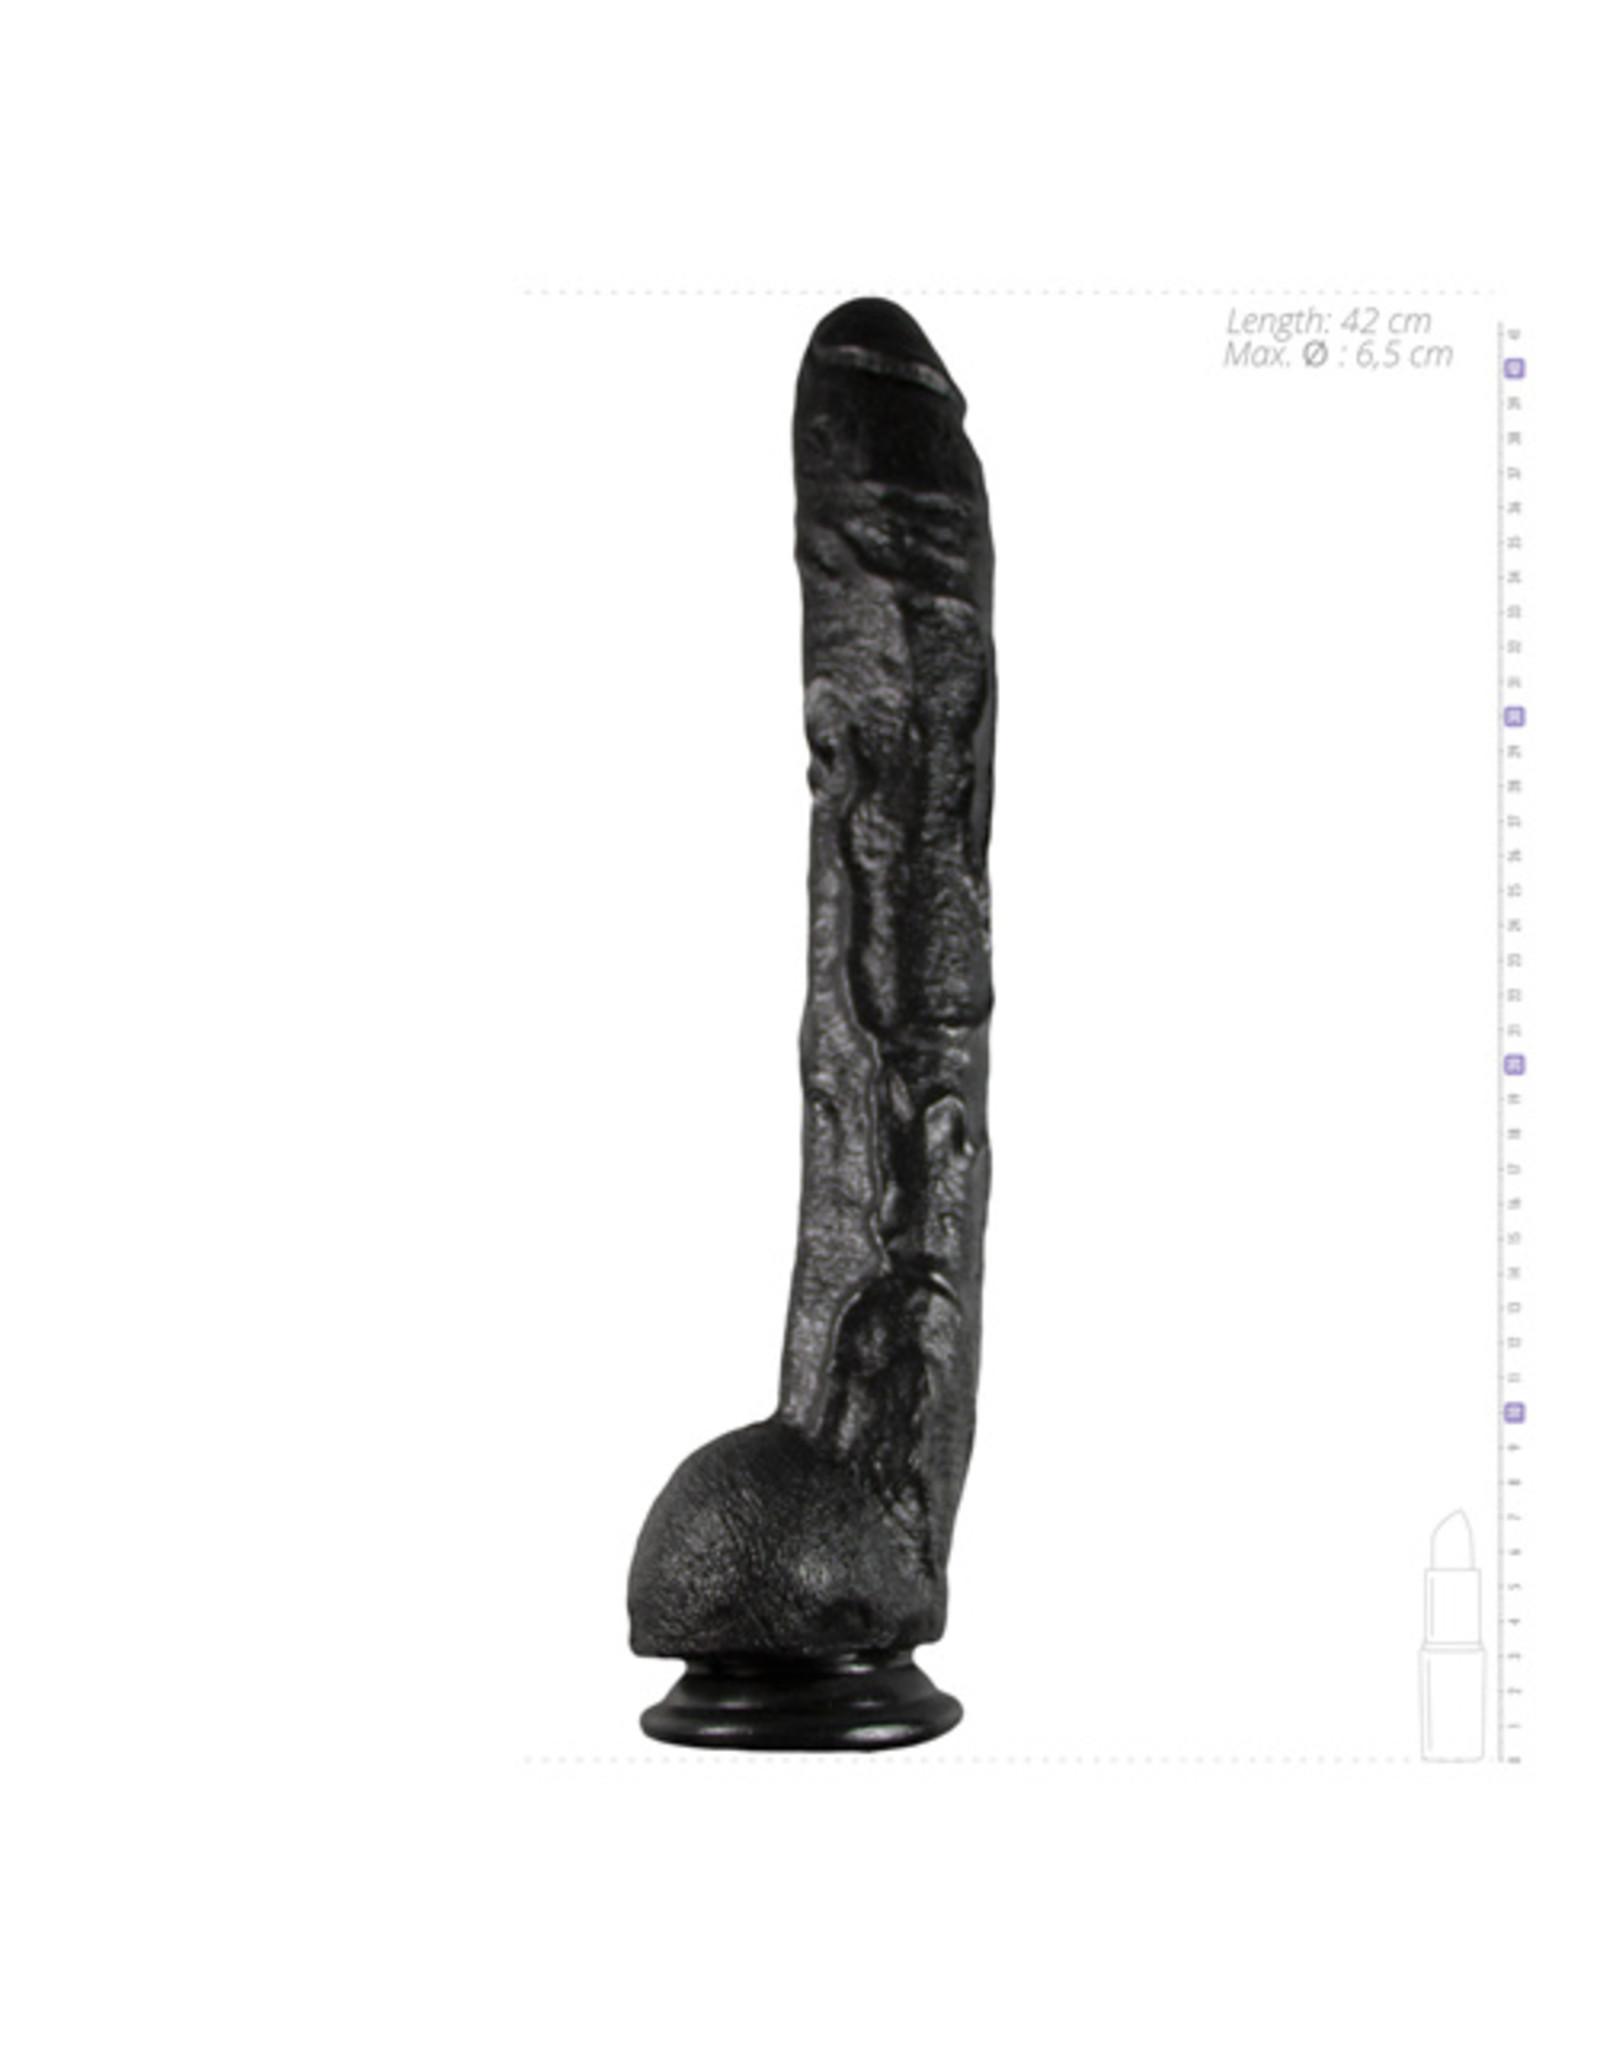 The Classics Dick Rambone XL Dildo - 33 cm